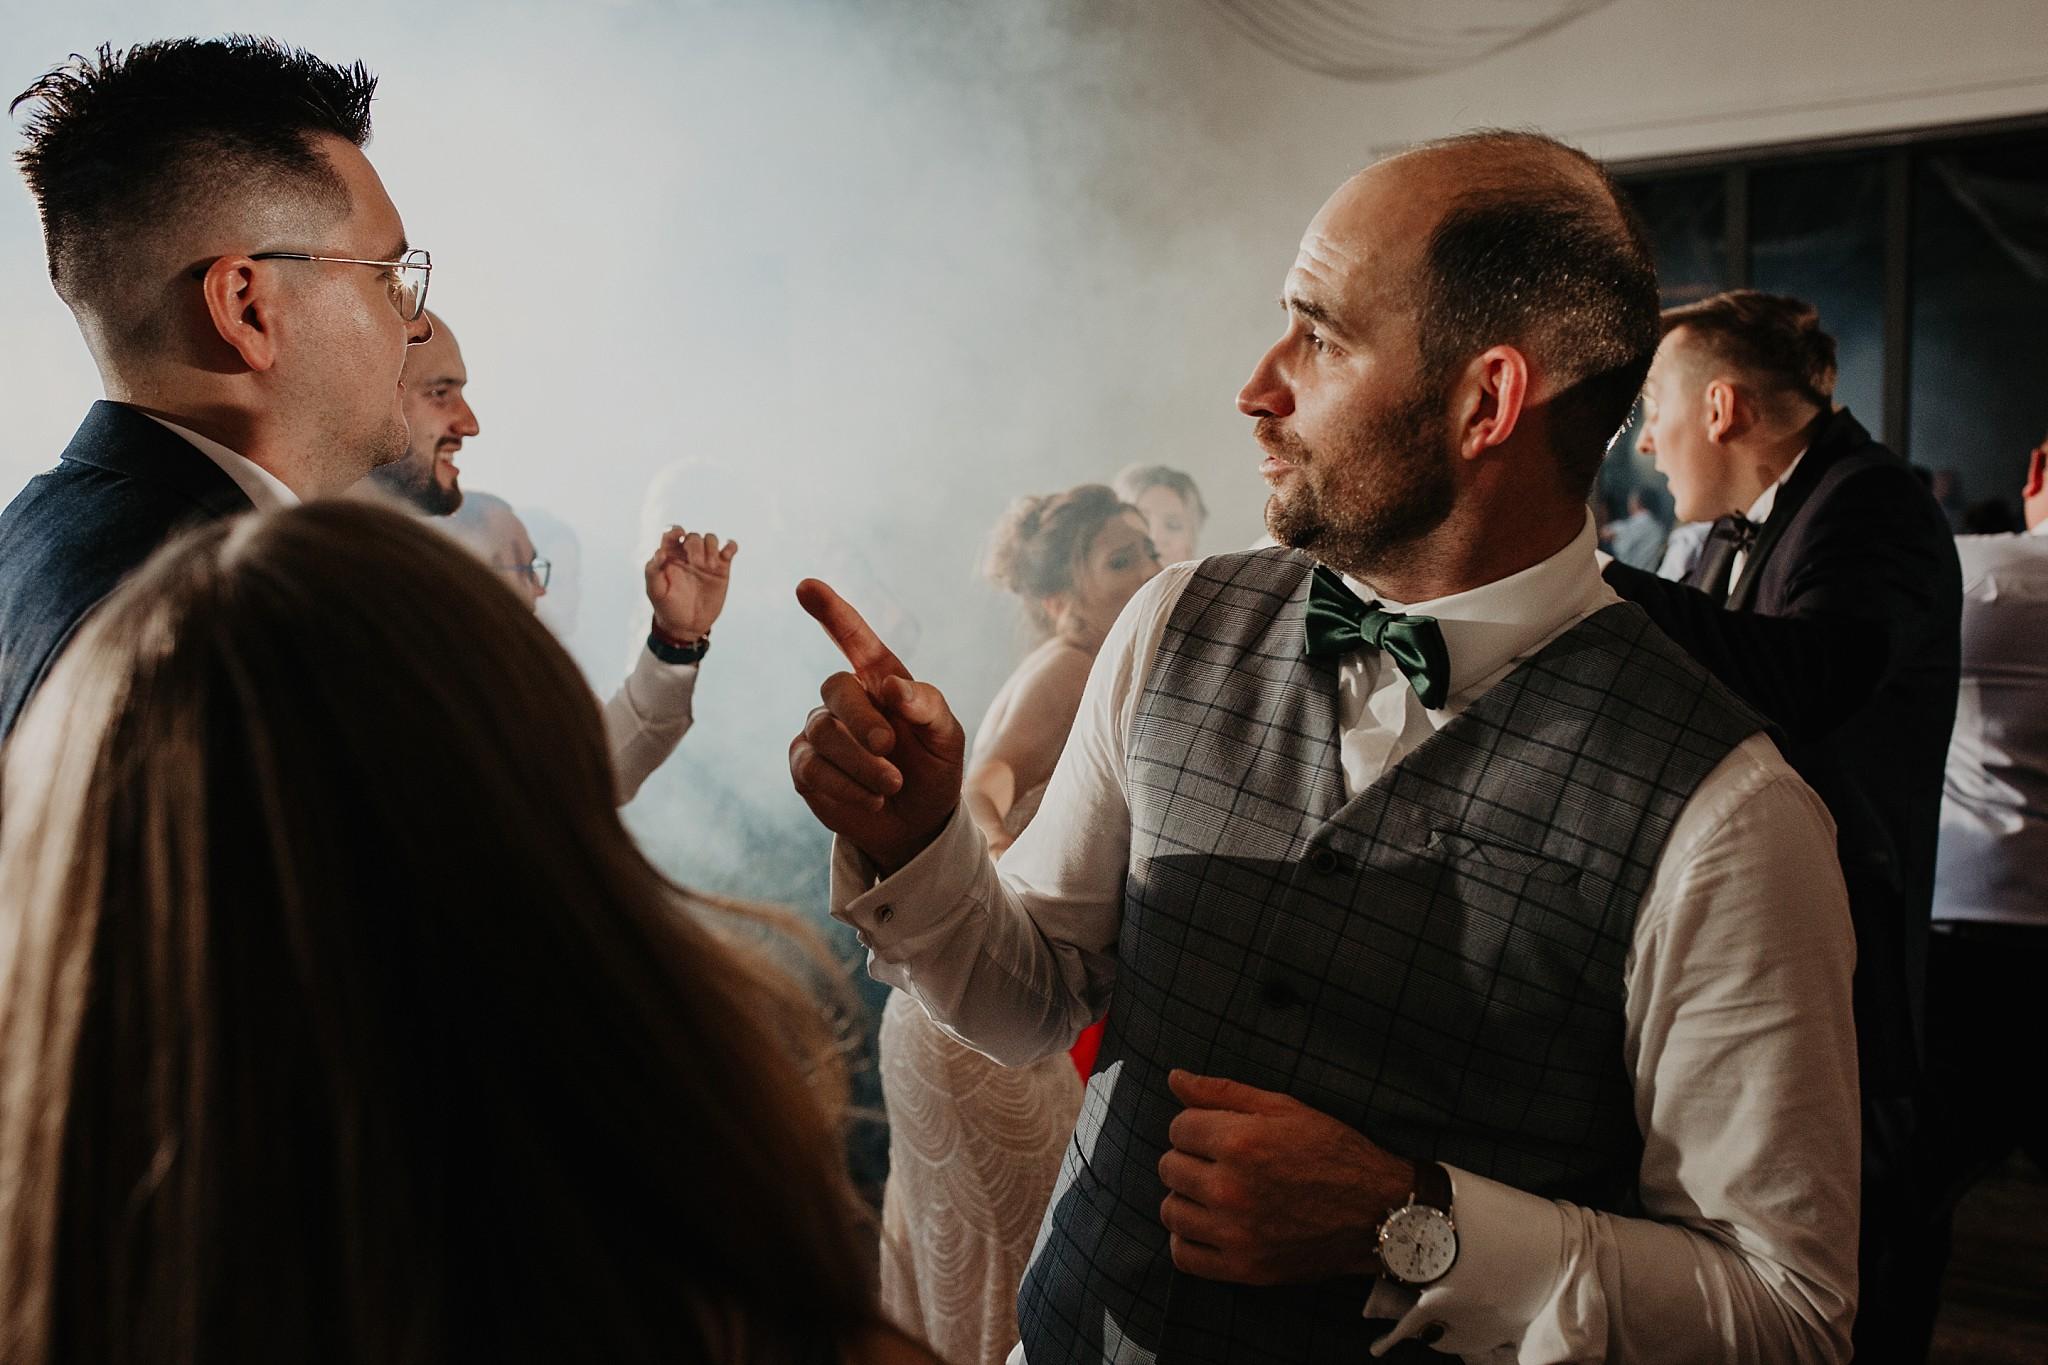 fotograf poznan wesele dobra truskawka piekne wesele pod poznaniem wesele w dobrej truskawce piekna para mloda slub marzen slub koronawirus slub listopad wesele koronawirus 483